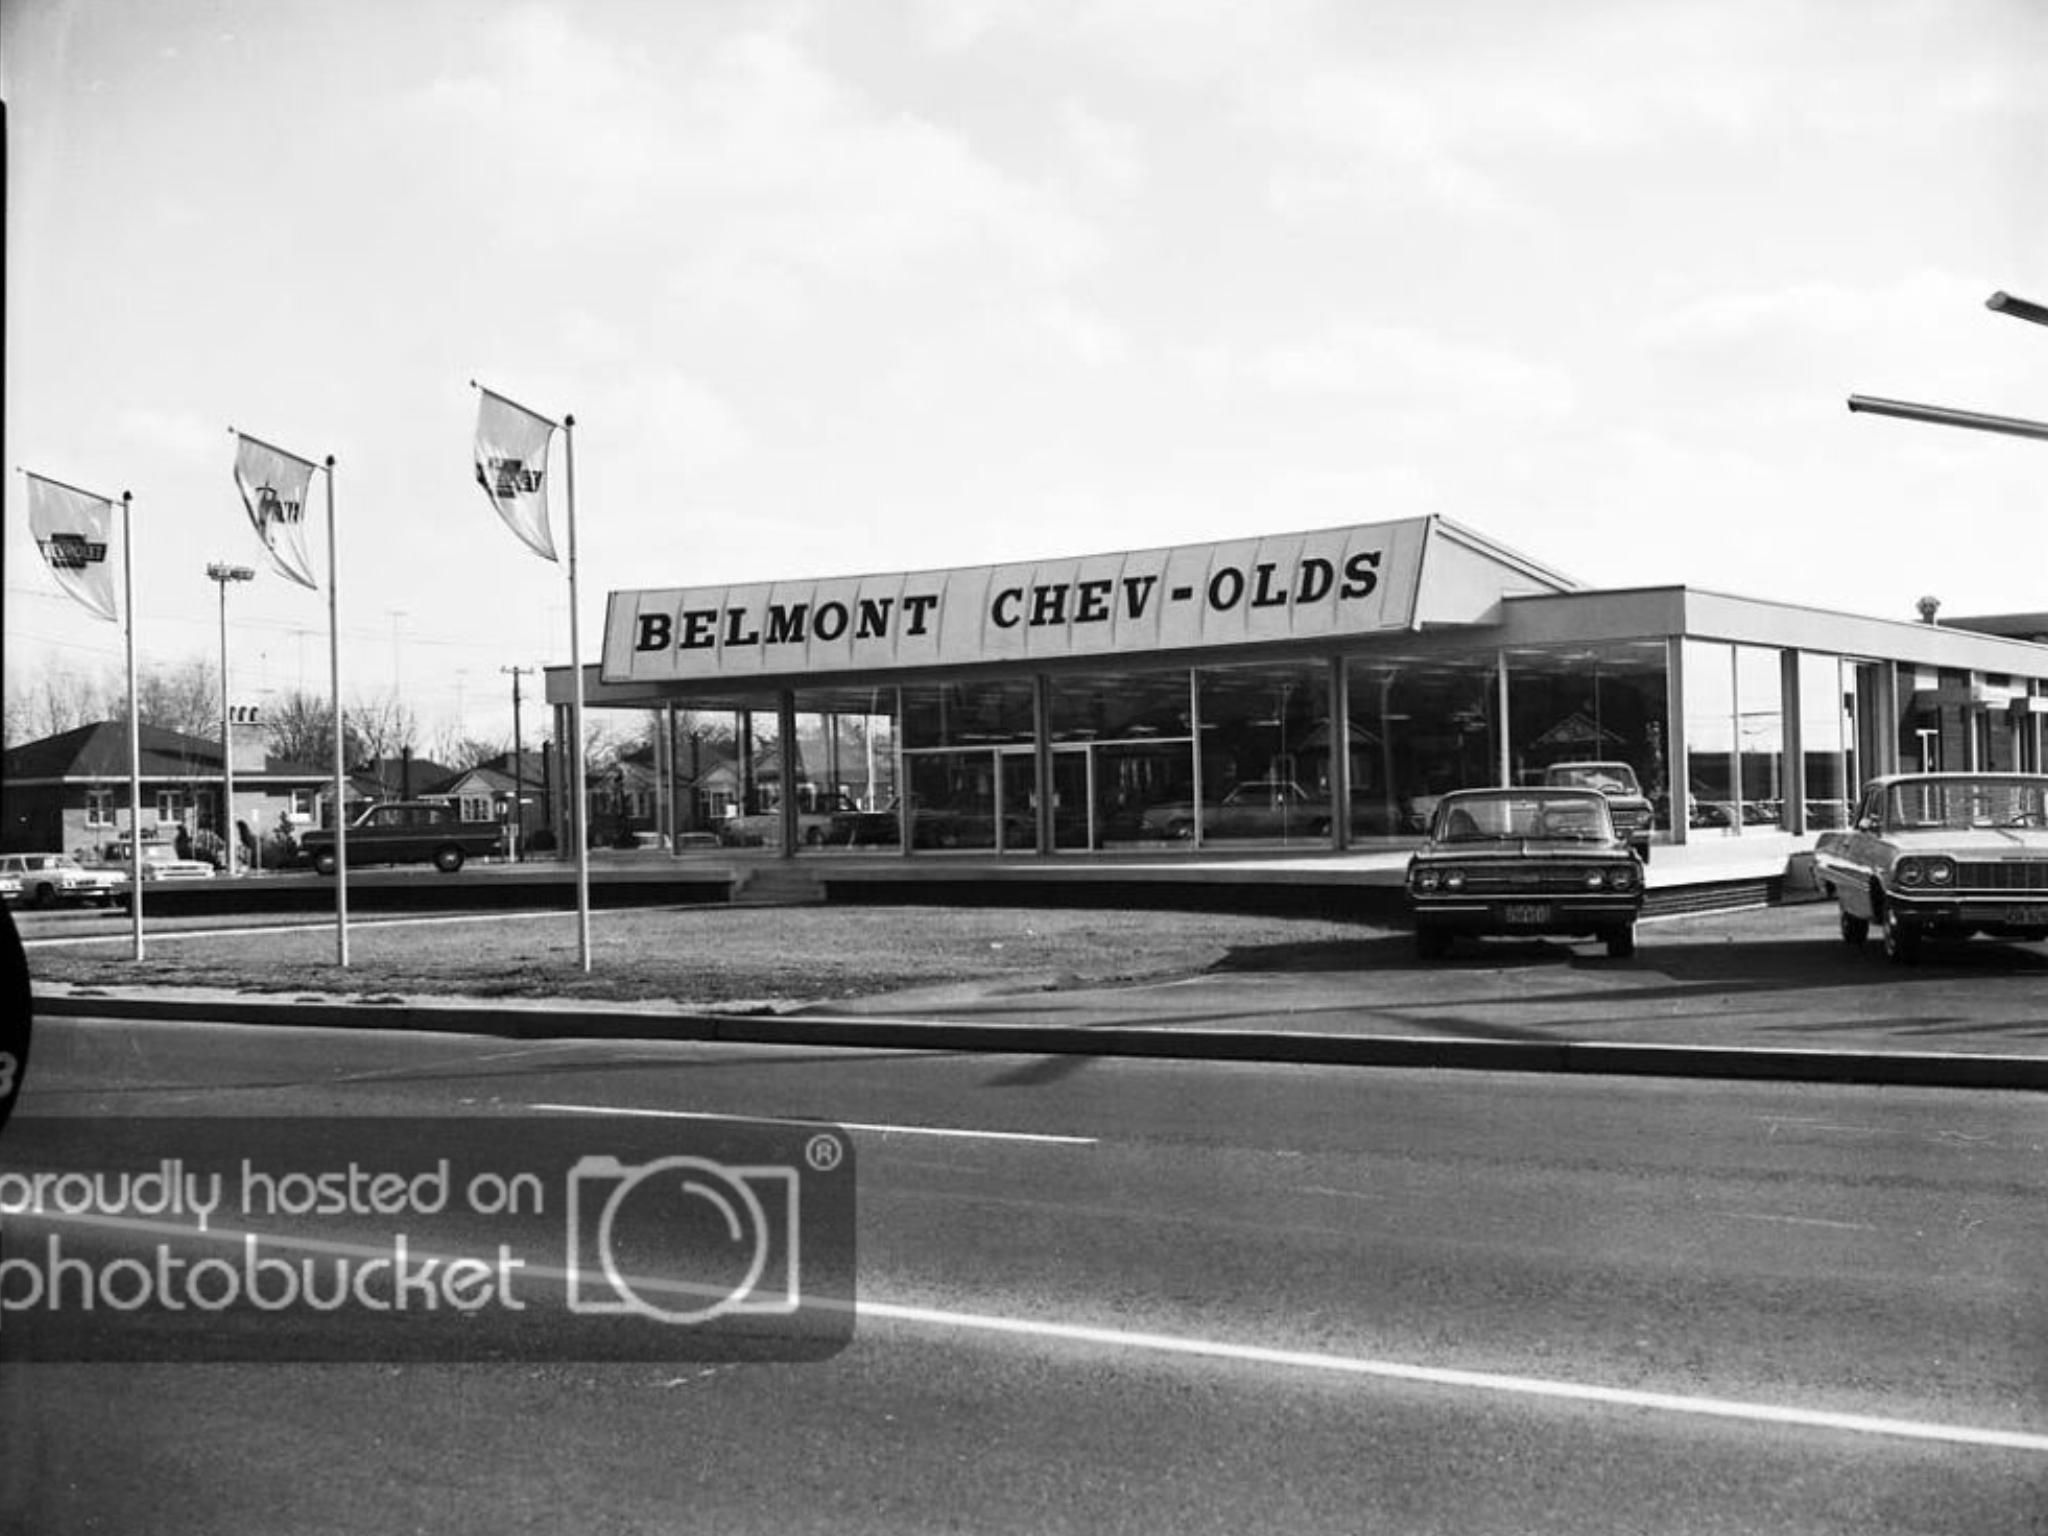 Belmont Chevrolet Oldsmobile Dealership Toronto Ontario Canada Gas Station Car Dealership Used Car Lots